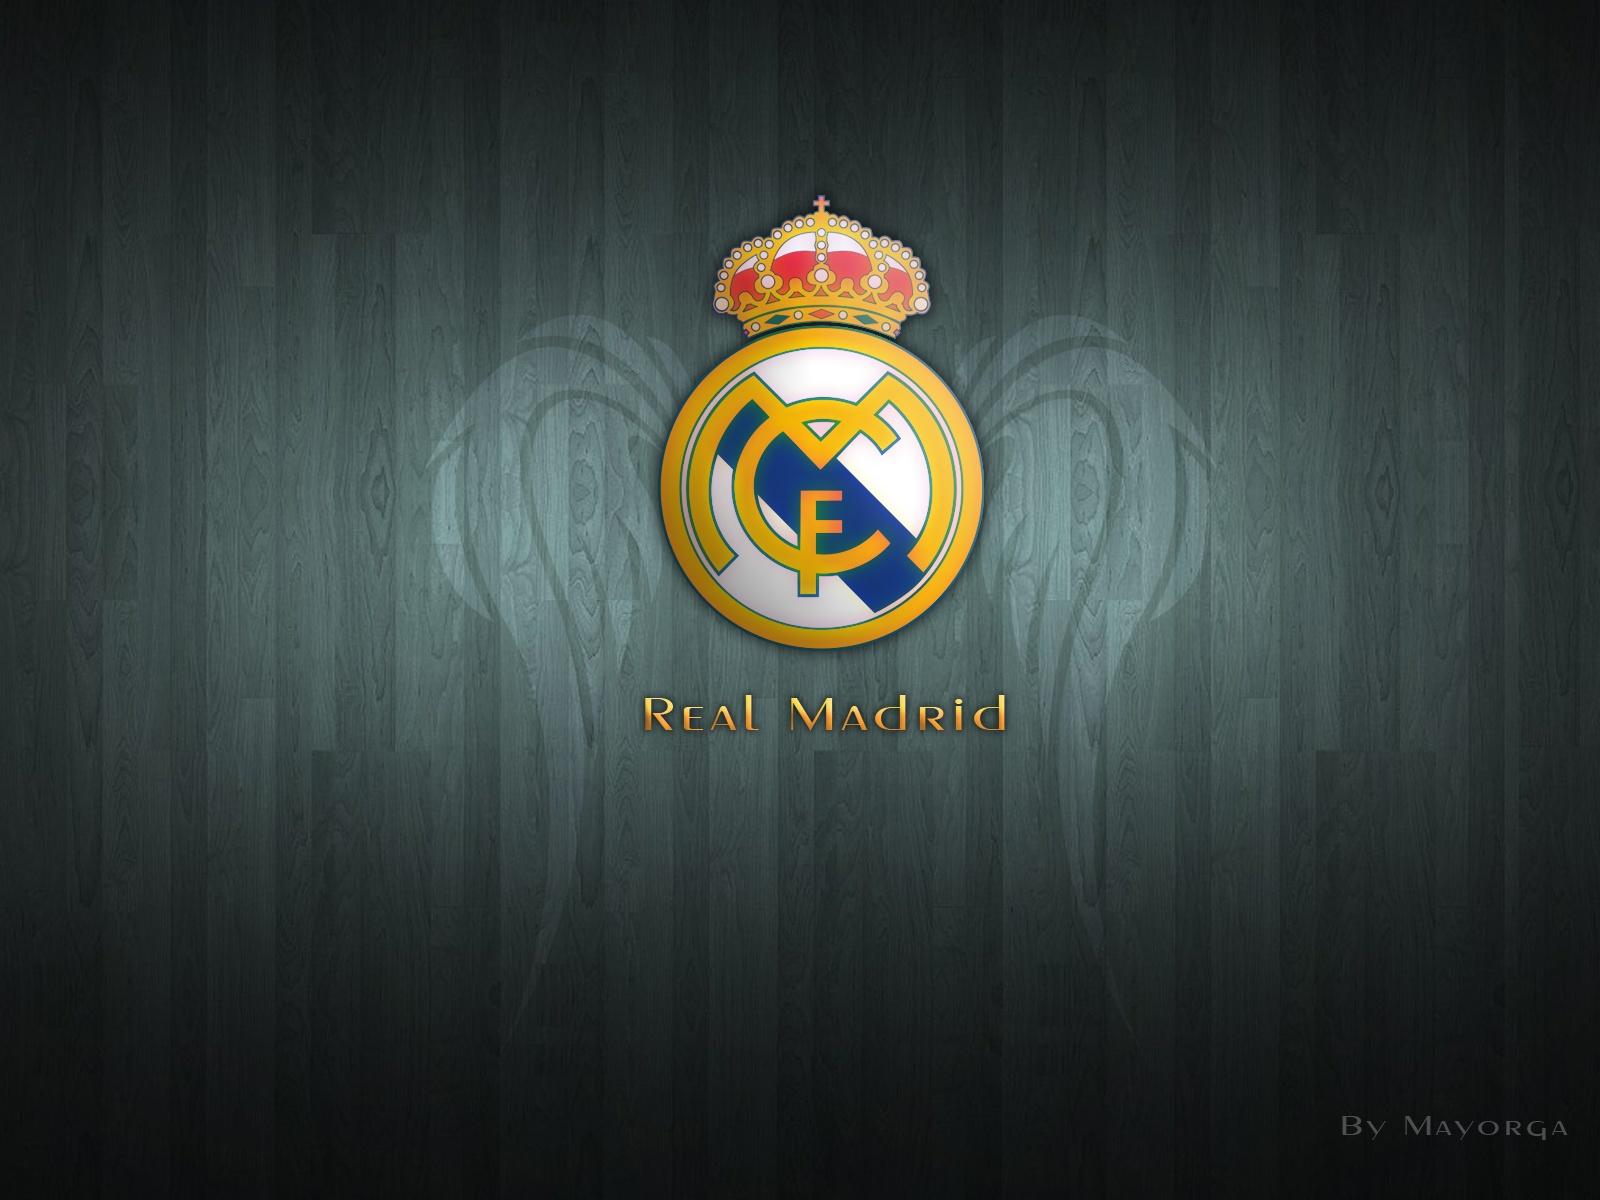 Real Madrid C.F. - Wikipedia, the free encyclopedia